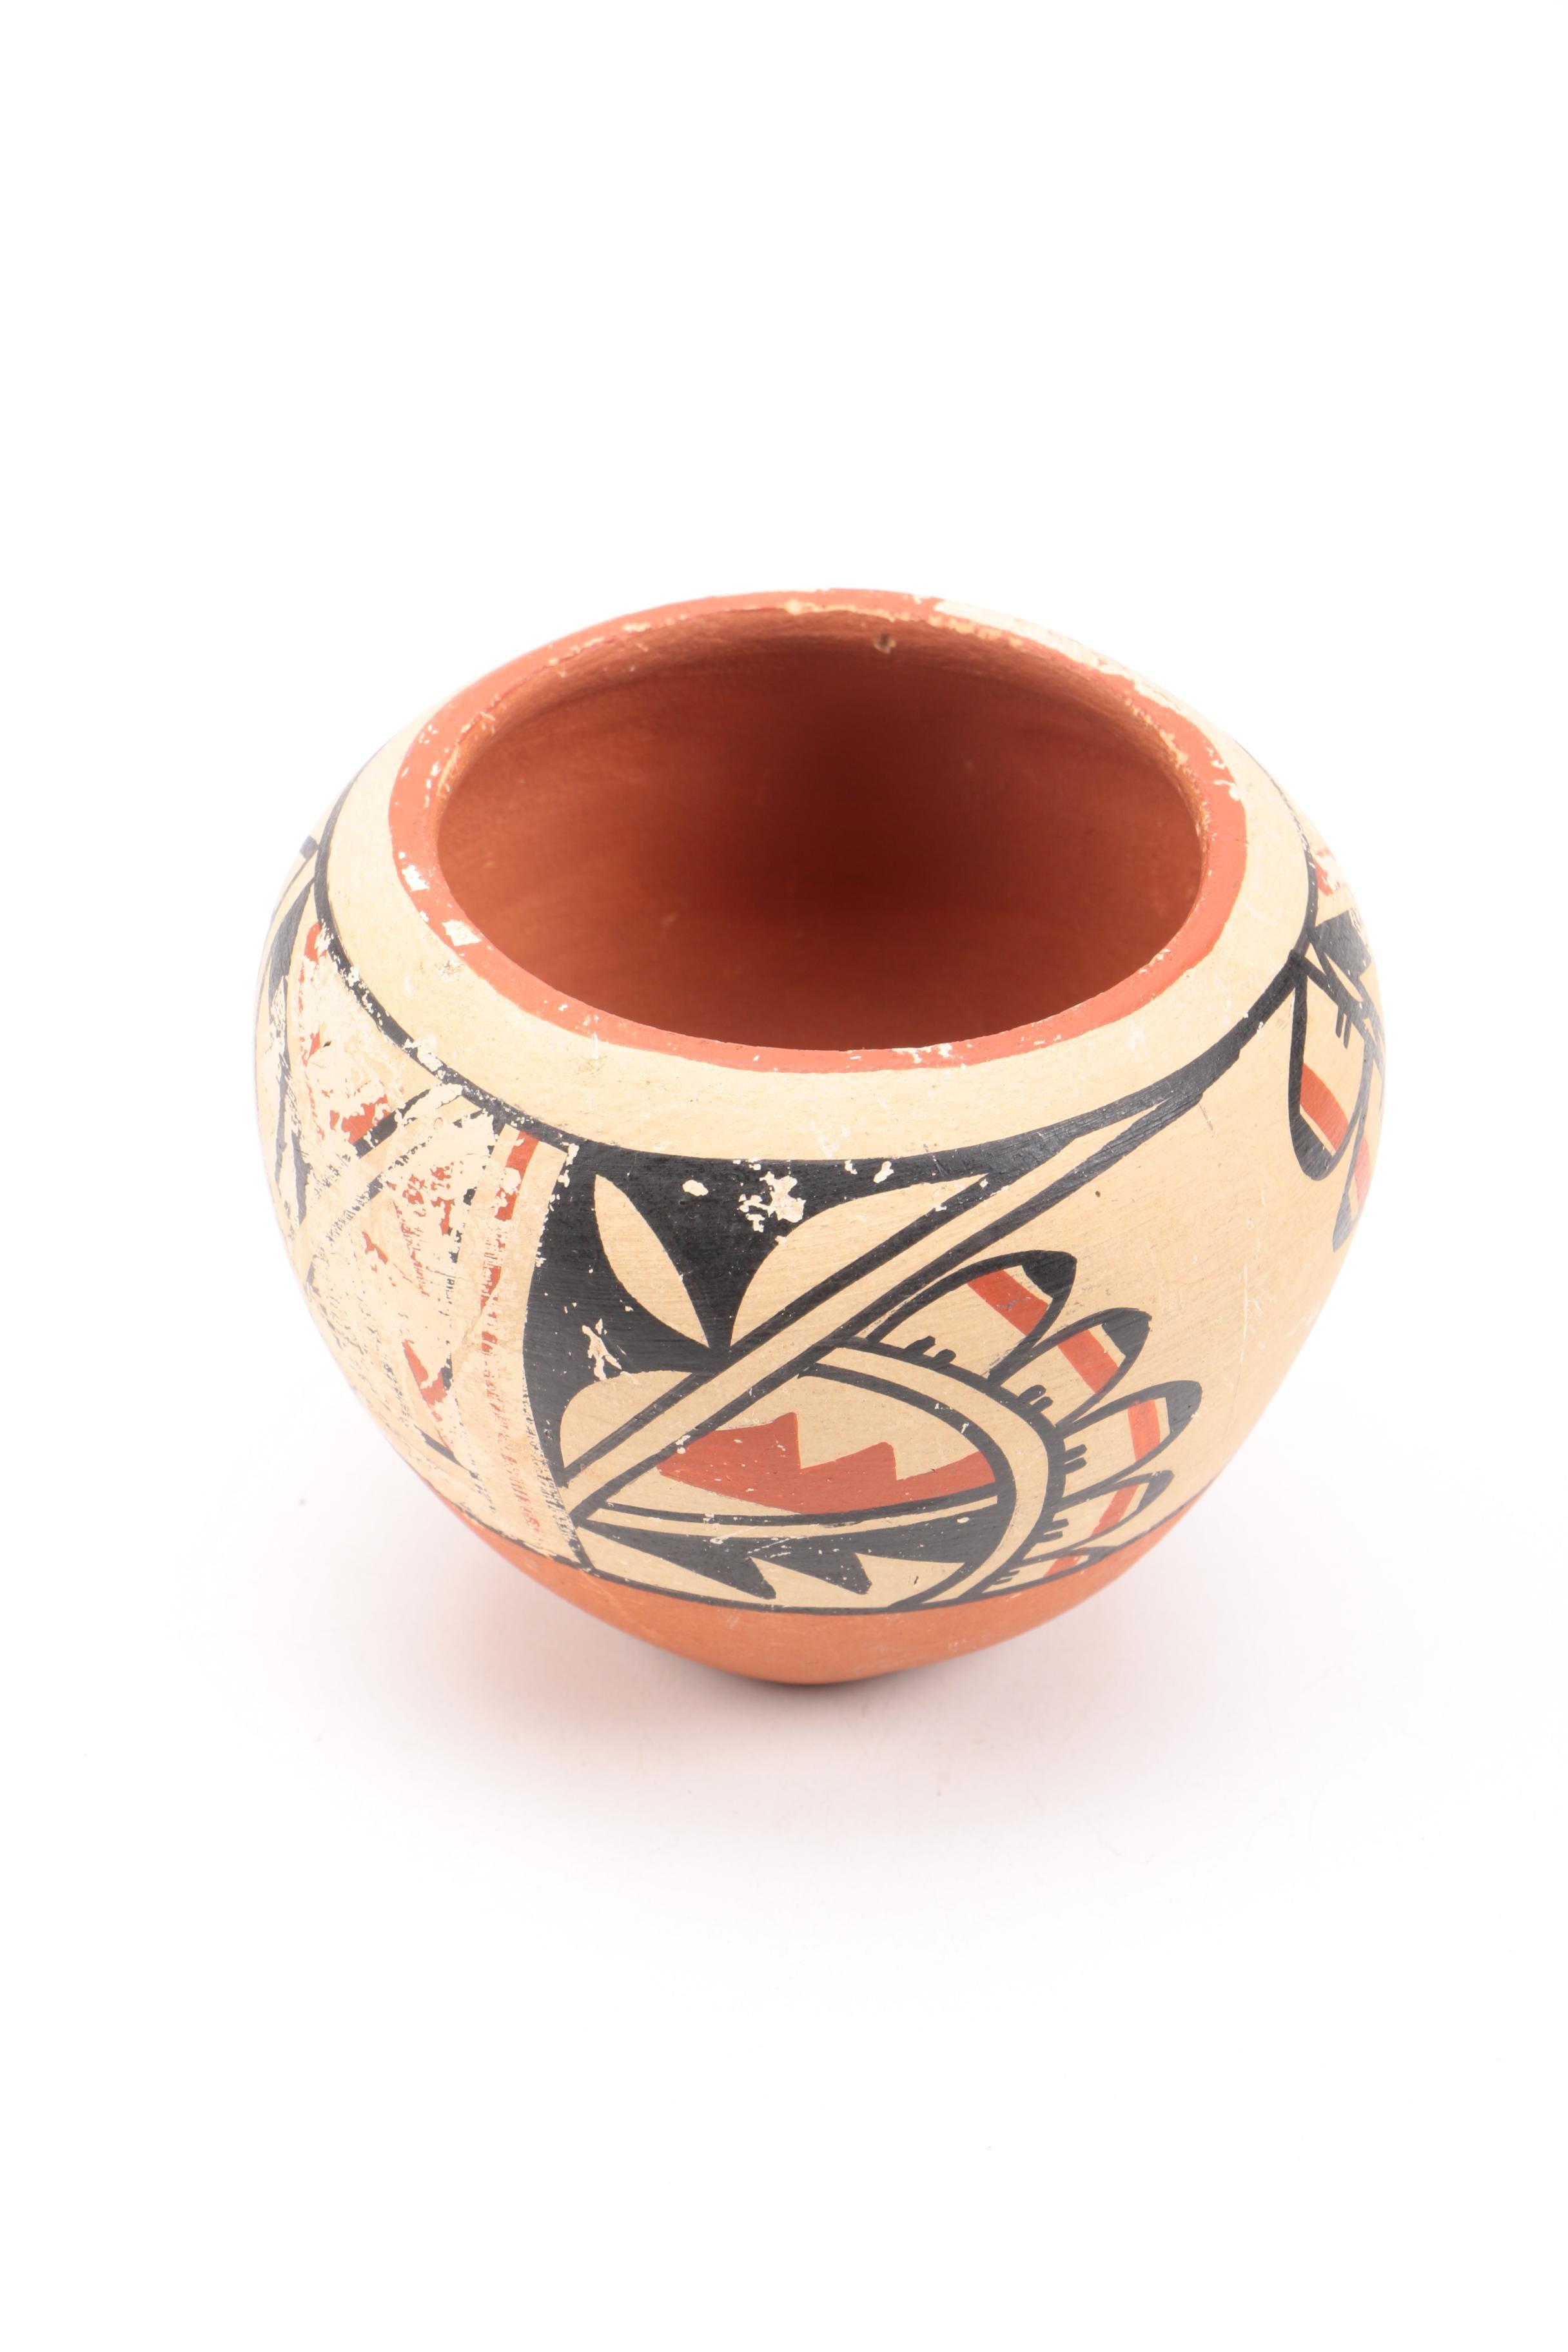 Signed Lucy Toya Jemez Pueblo Bowl